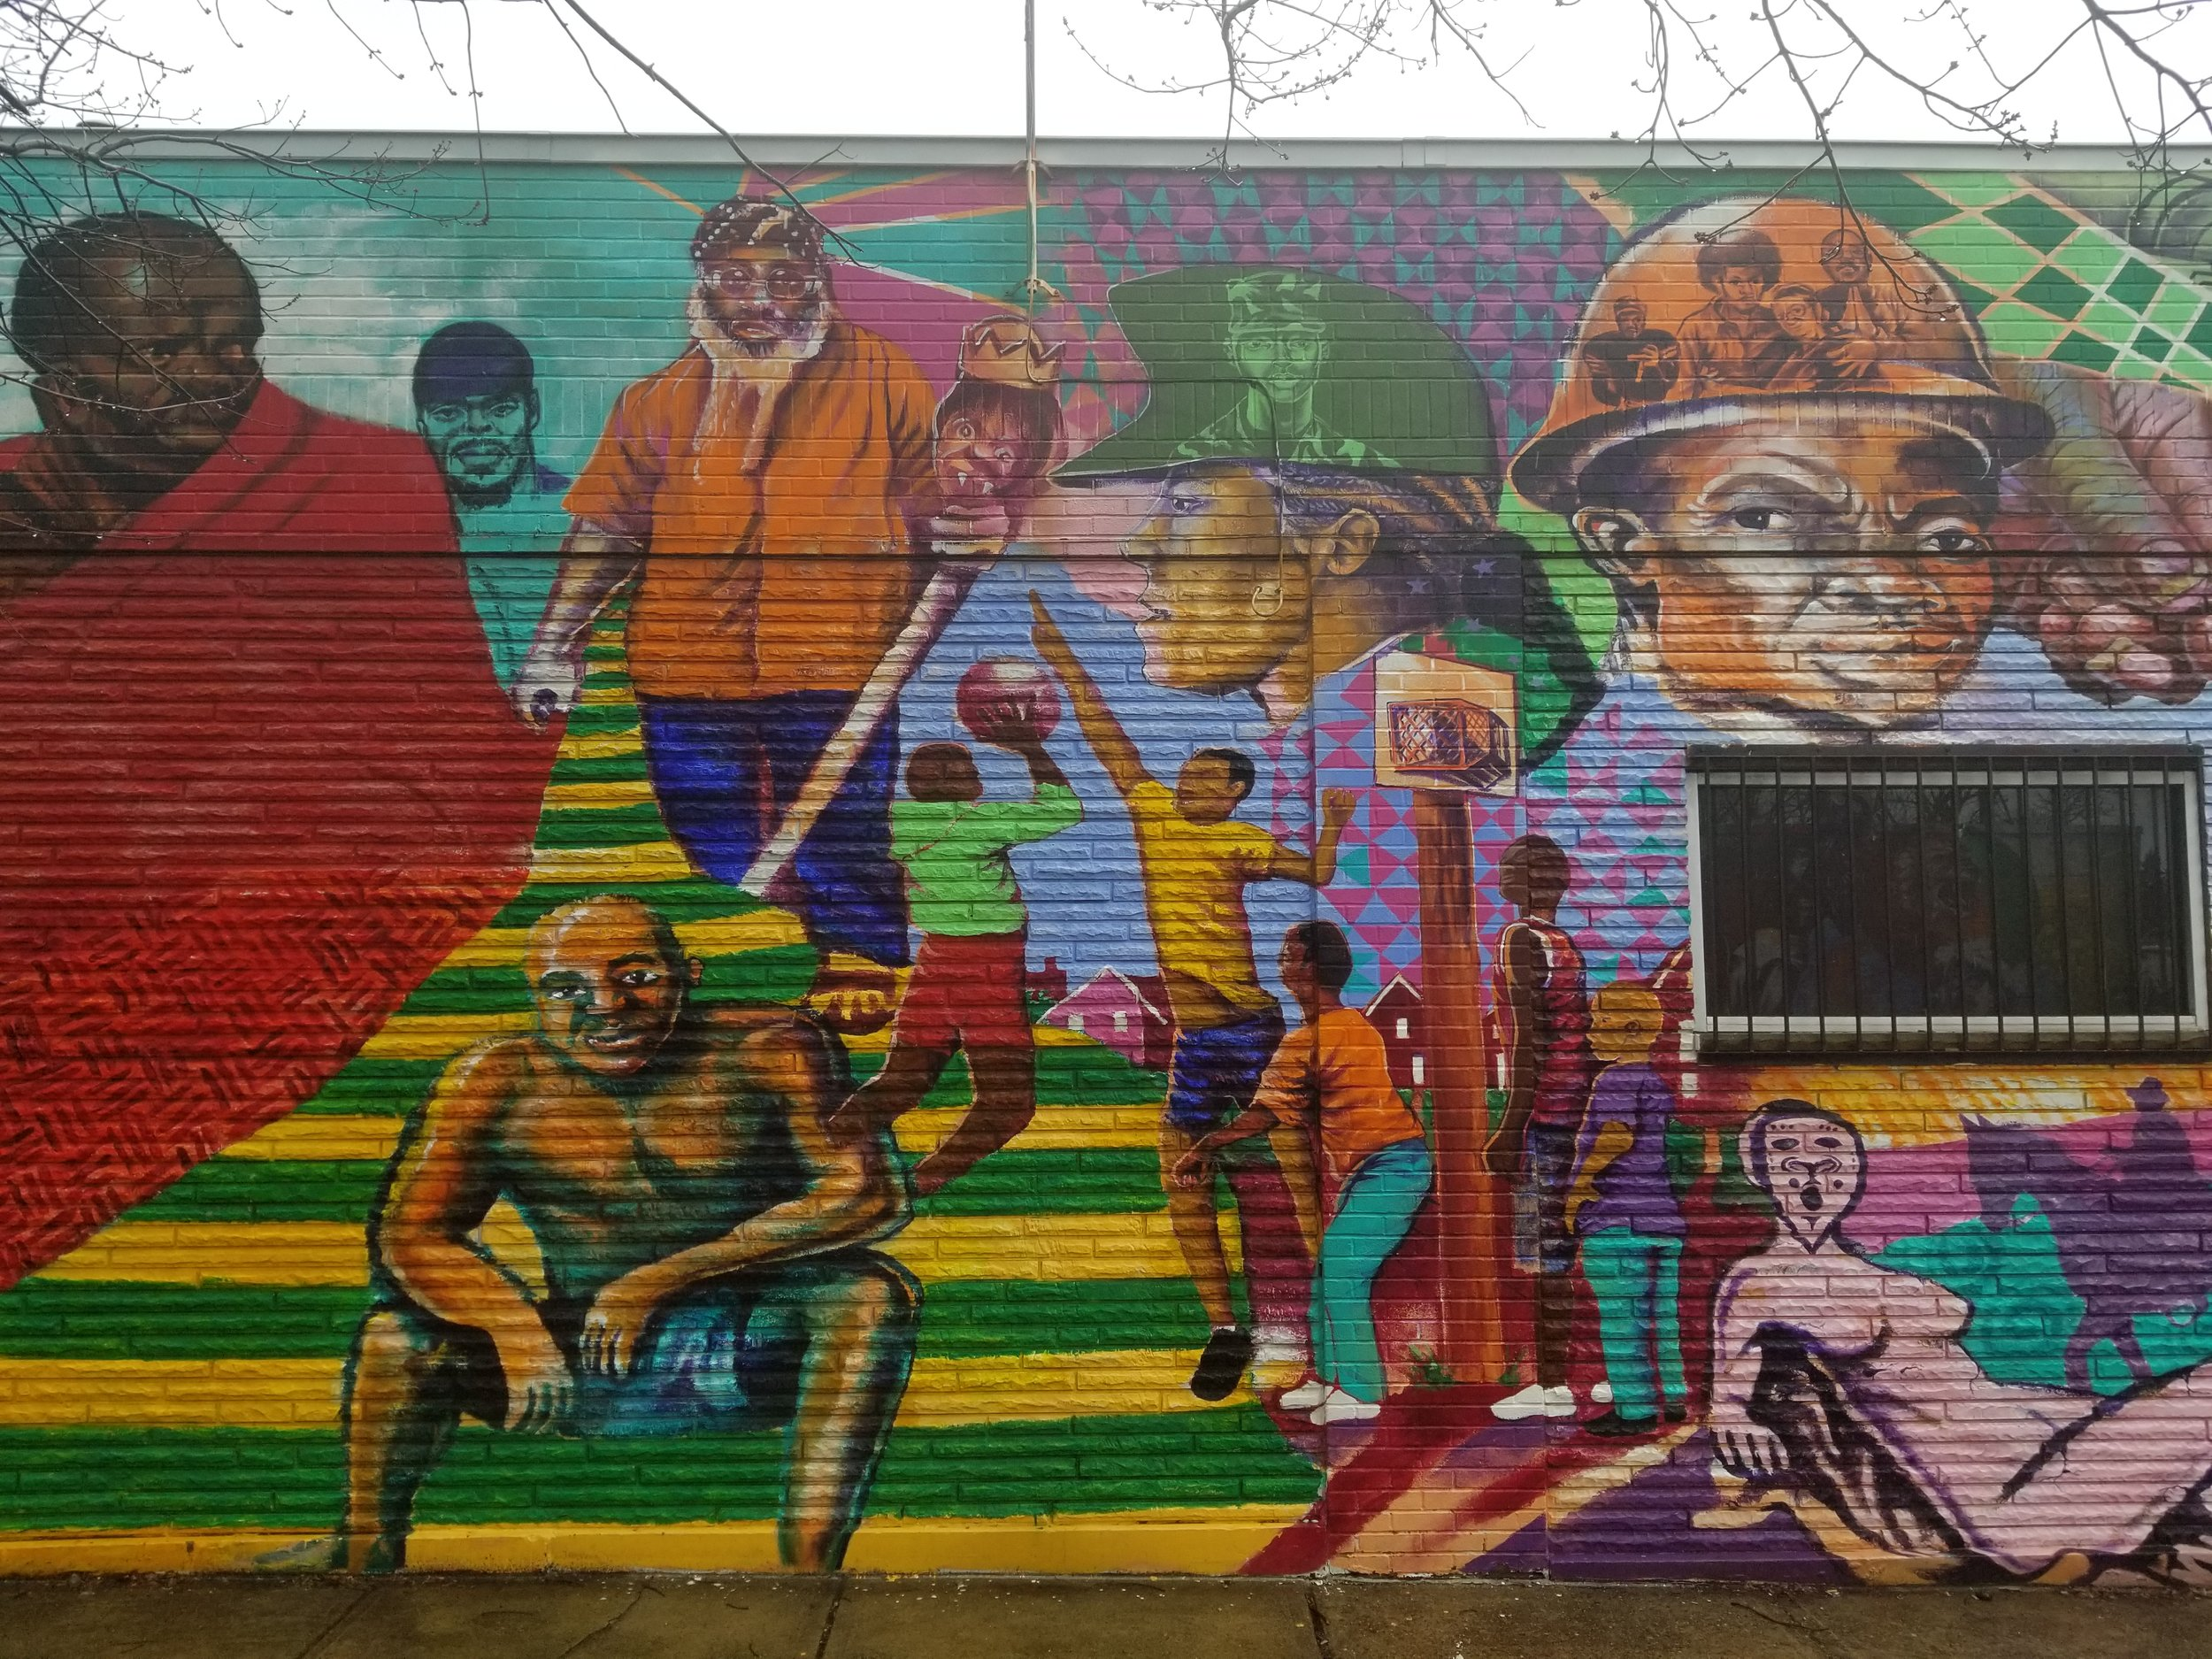 Strength Inc Mural by Kyle Holbrook, Chris Savido and Goerge Gist